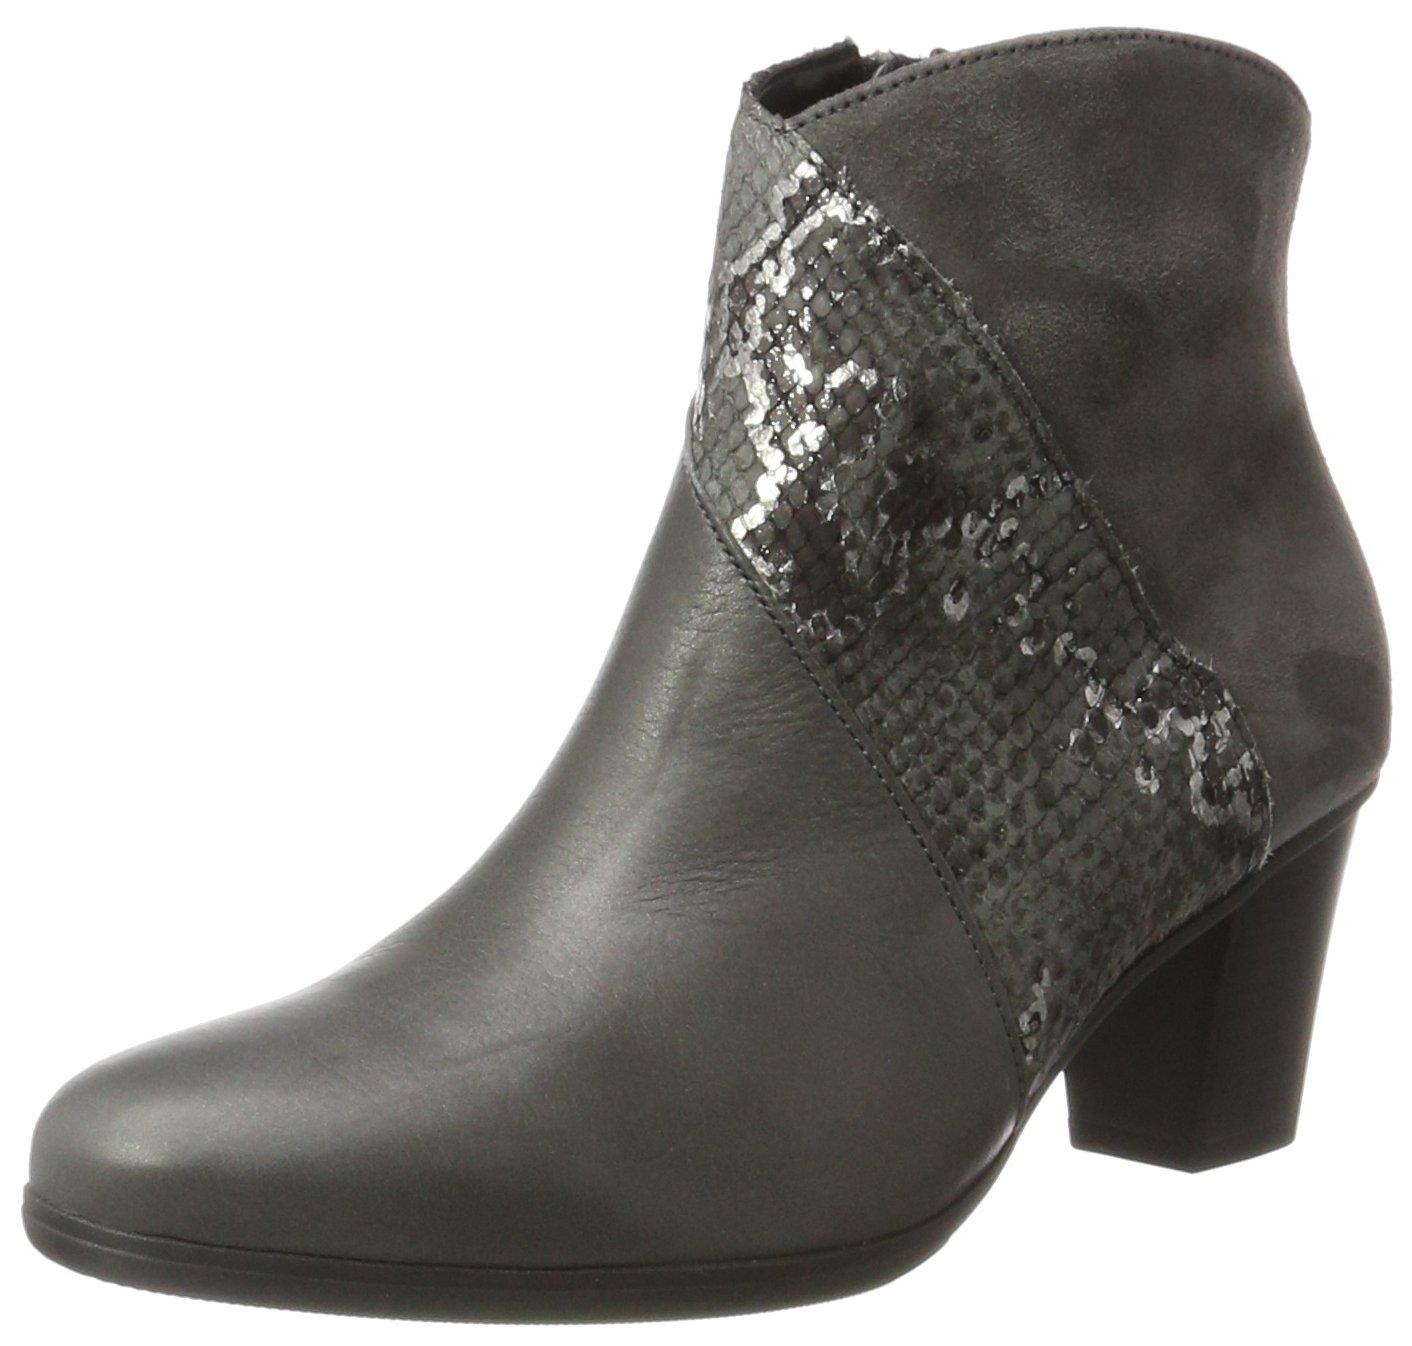 Dark Micro38 grey Gabor BasicBottes Shoes Eu FemmeGris69 l1JFK3Tc